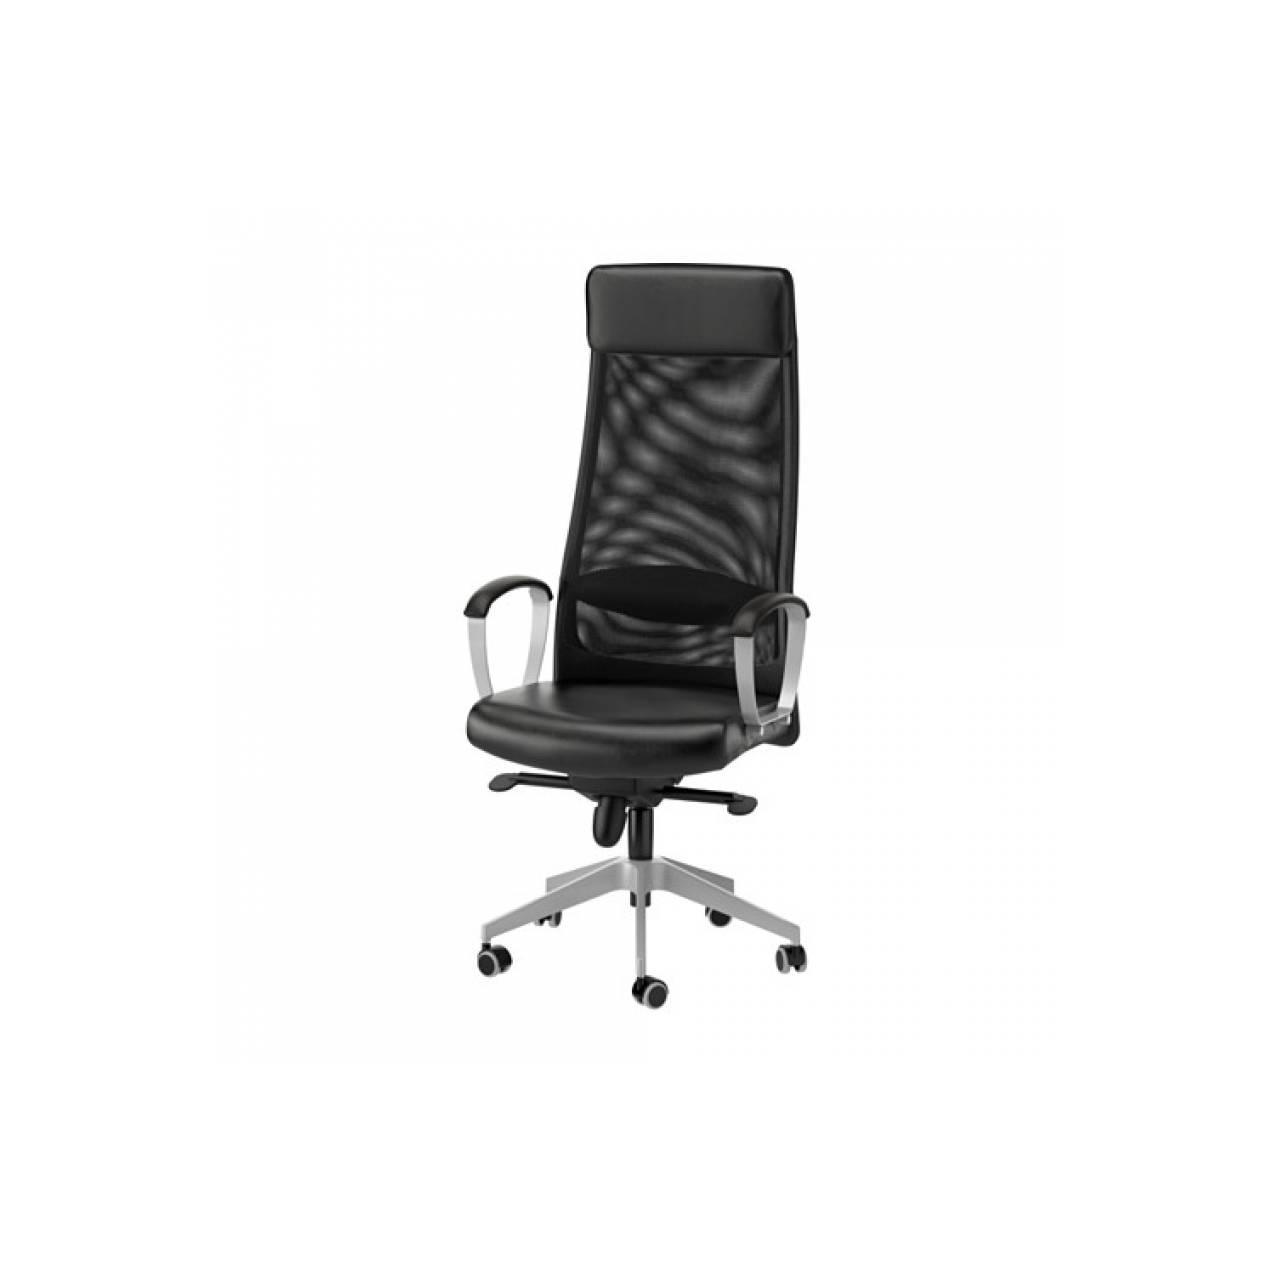 IKEA MARKUS Kursi putar / Kursi Direktur Kantor, Glose Robust hitam